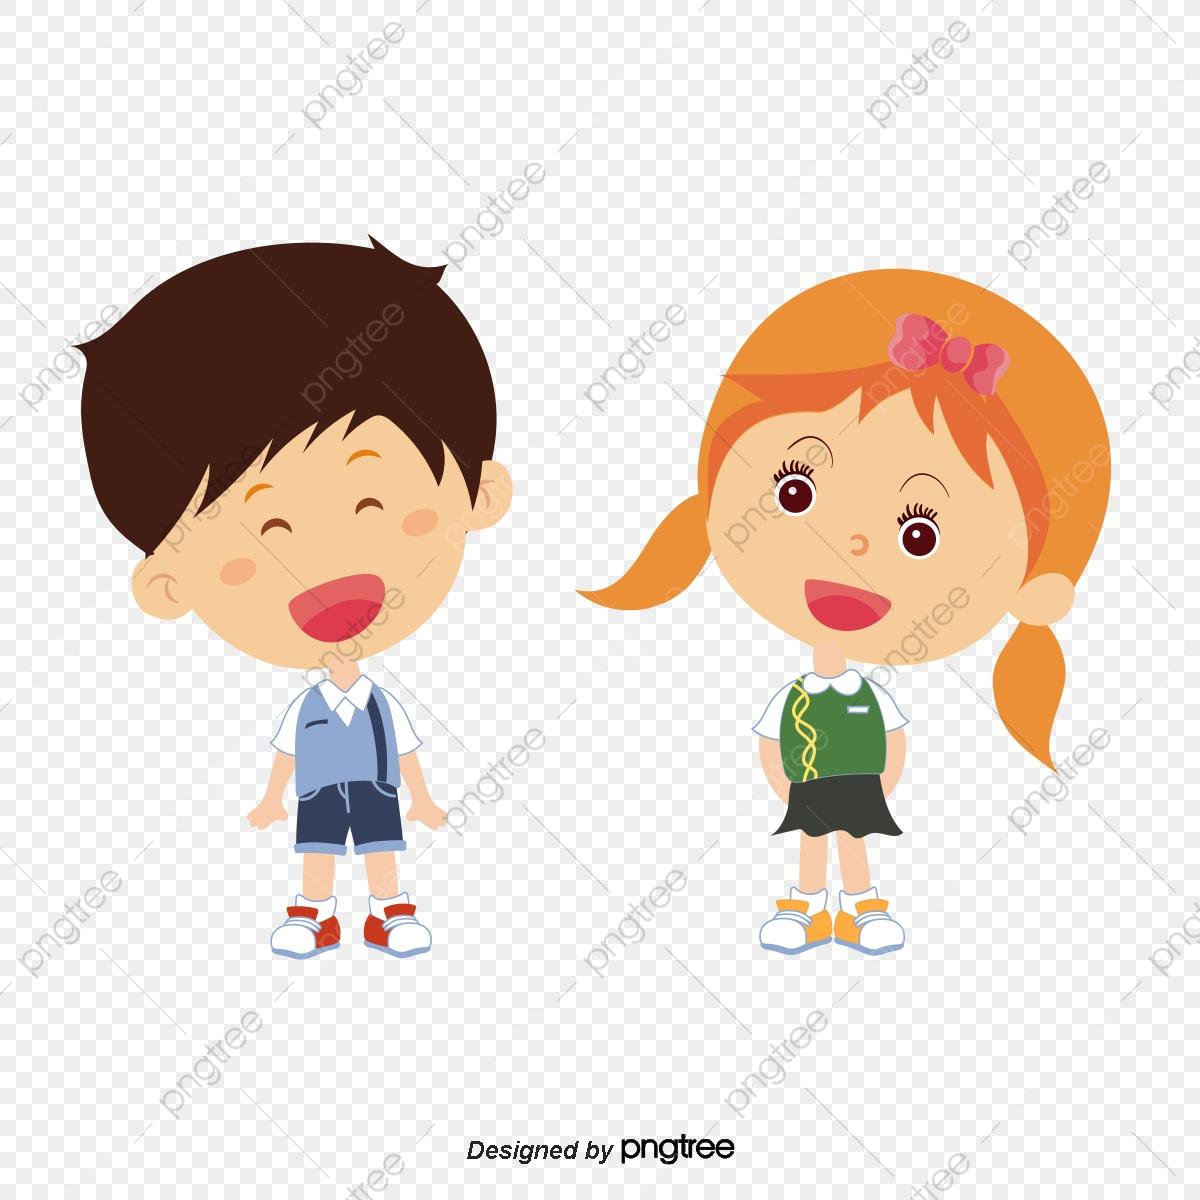 School Children, Children, Clipart, School PNG Transparent.